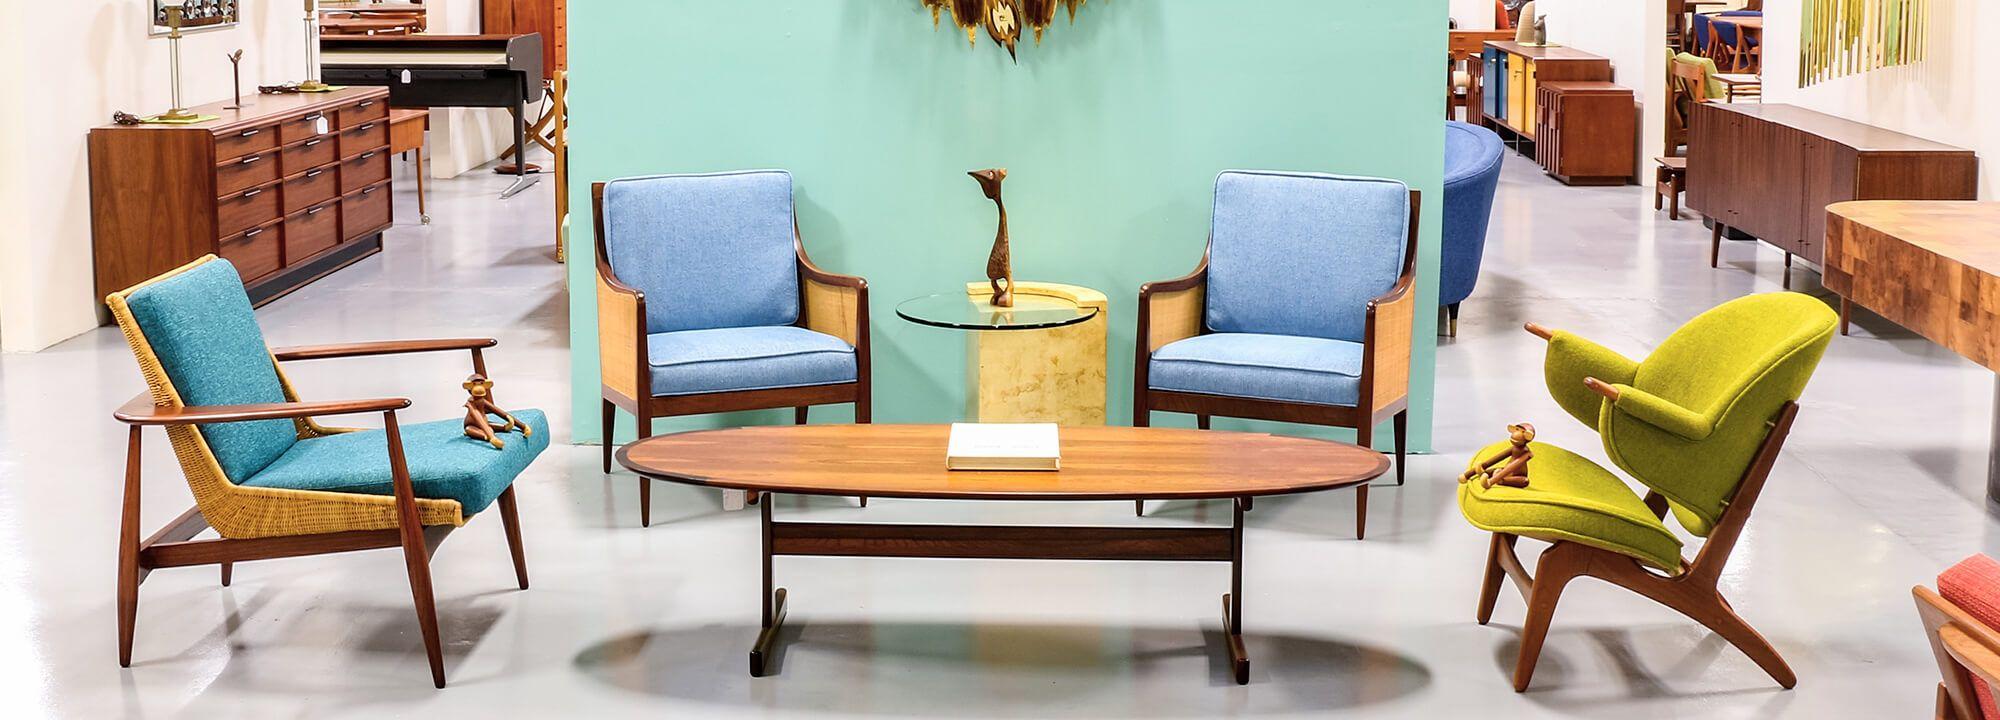 Shop Vintage Mid Century Modern Furniture U0026 Decor At Danish Modern. We  Supply Authentic Furnishings